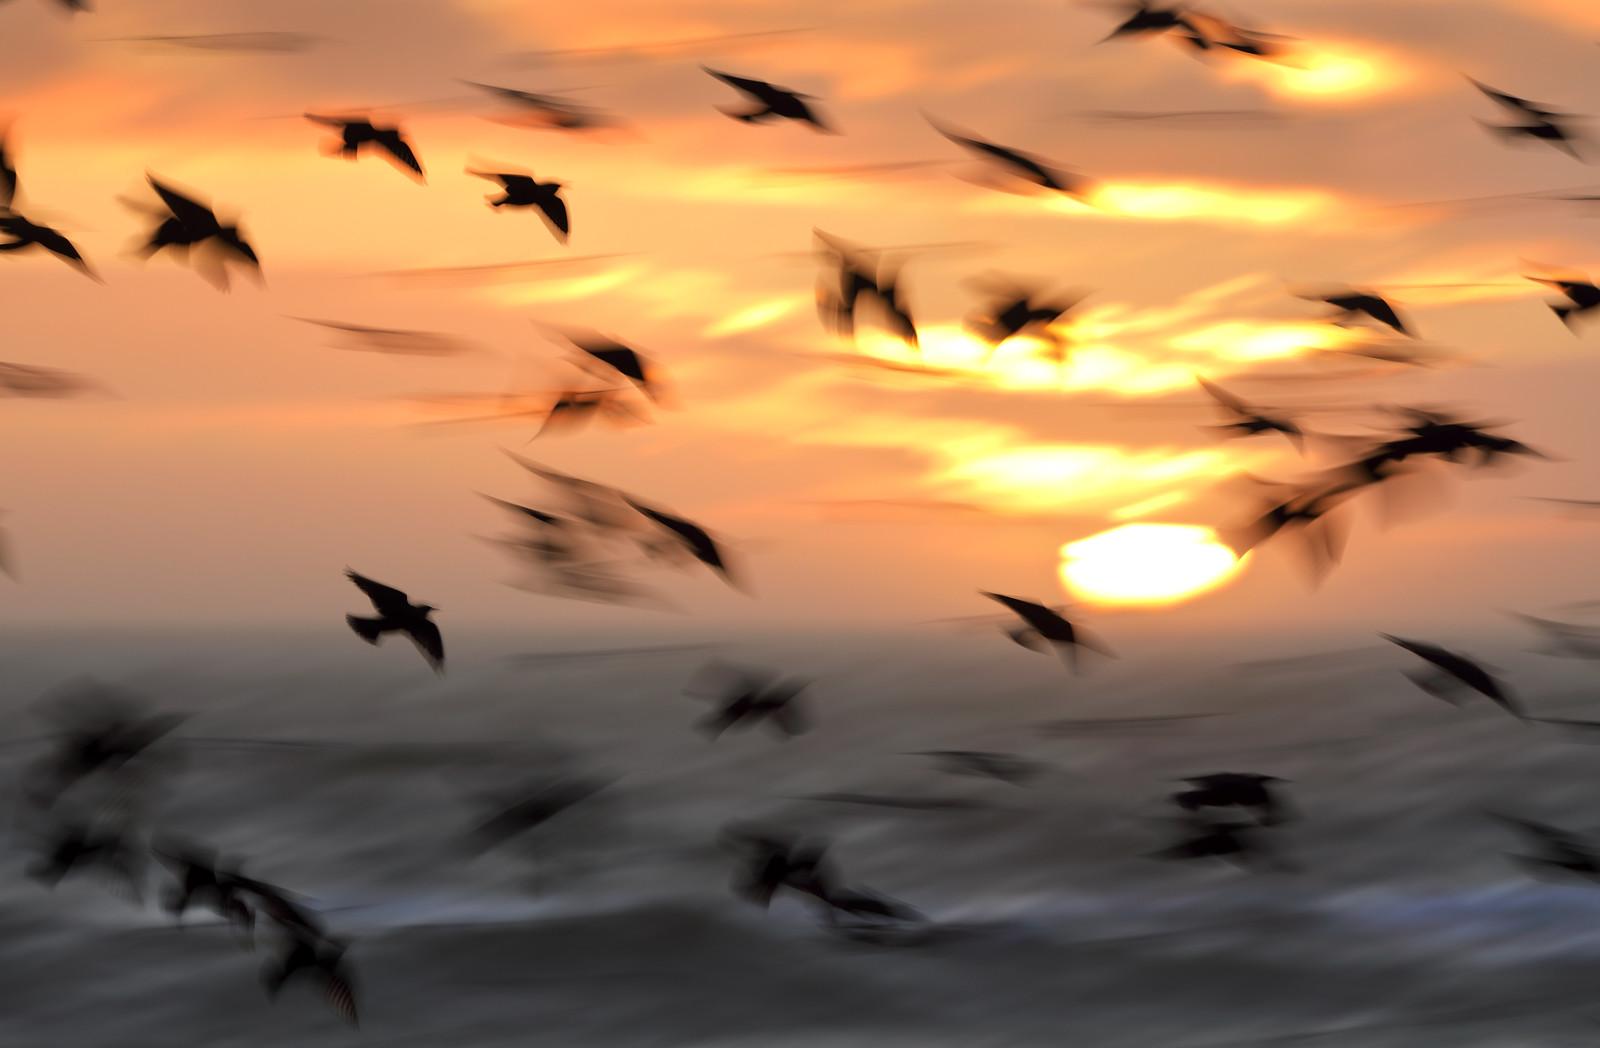 Brighton Starling Blurmuration at Sunset